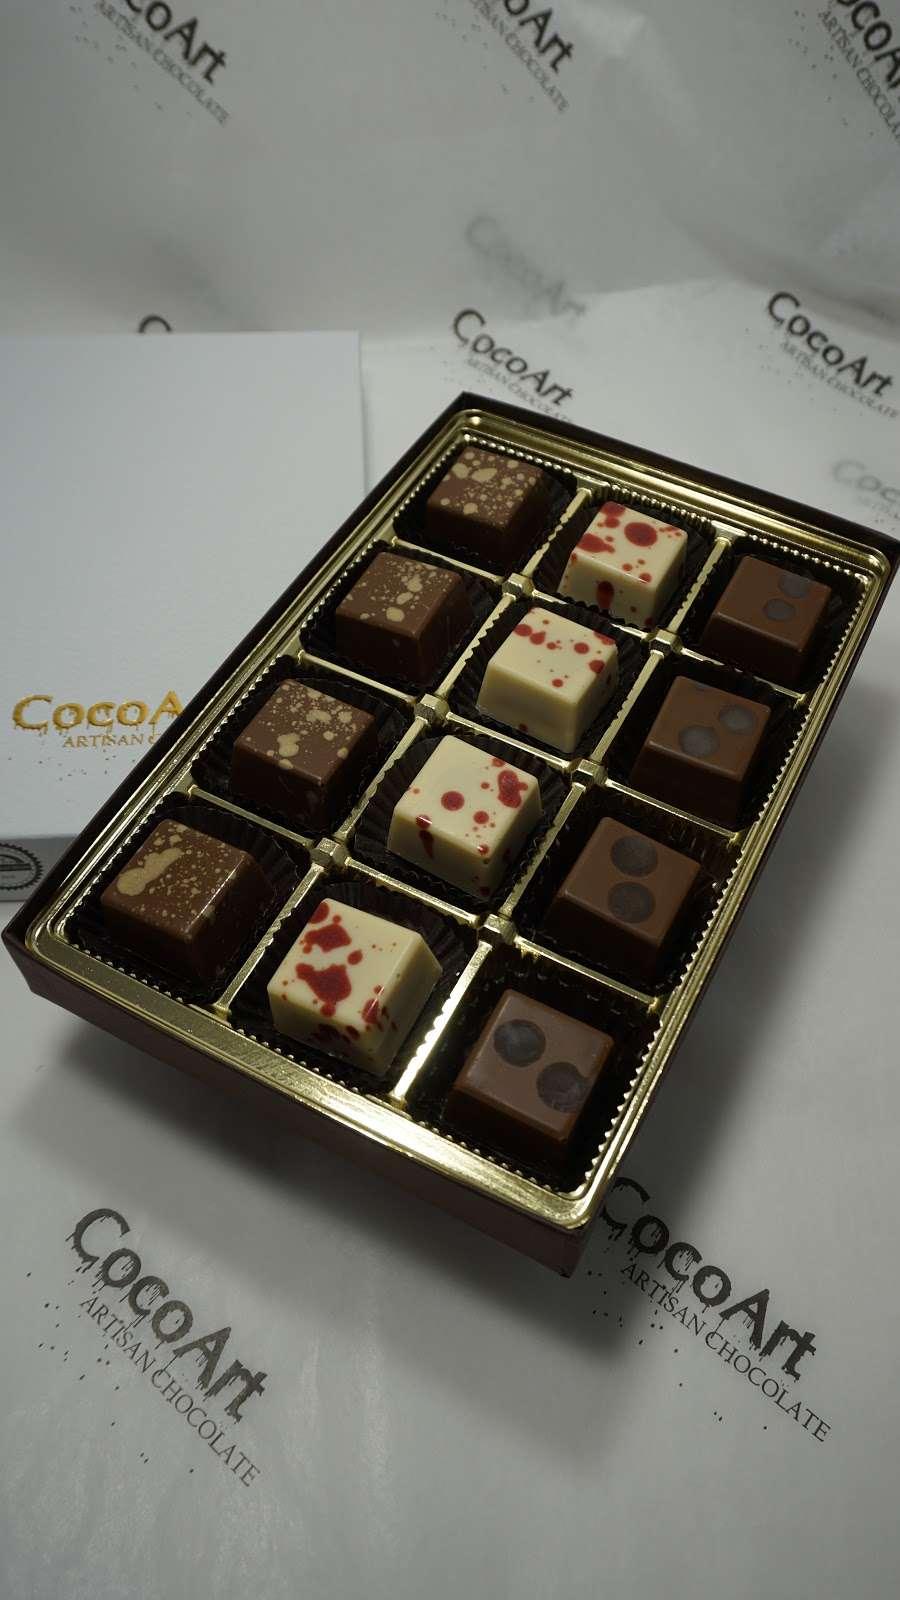 CocoArt Chocolate - store    Photo 10 of 10   Address: 20 Prag Blvd #002, Monroe, NY 10950, USA   Phone: (845) 248-1617